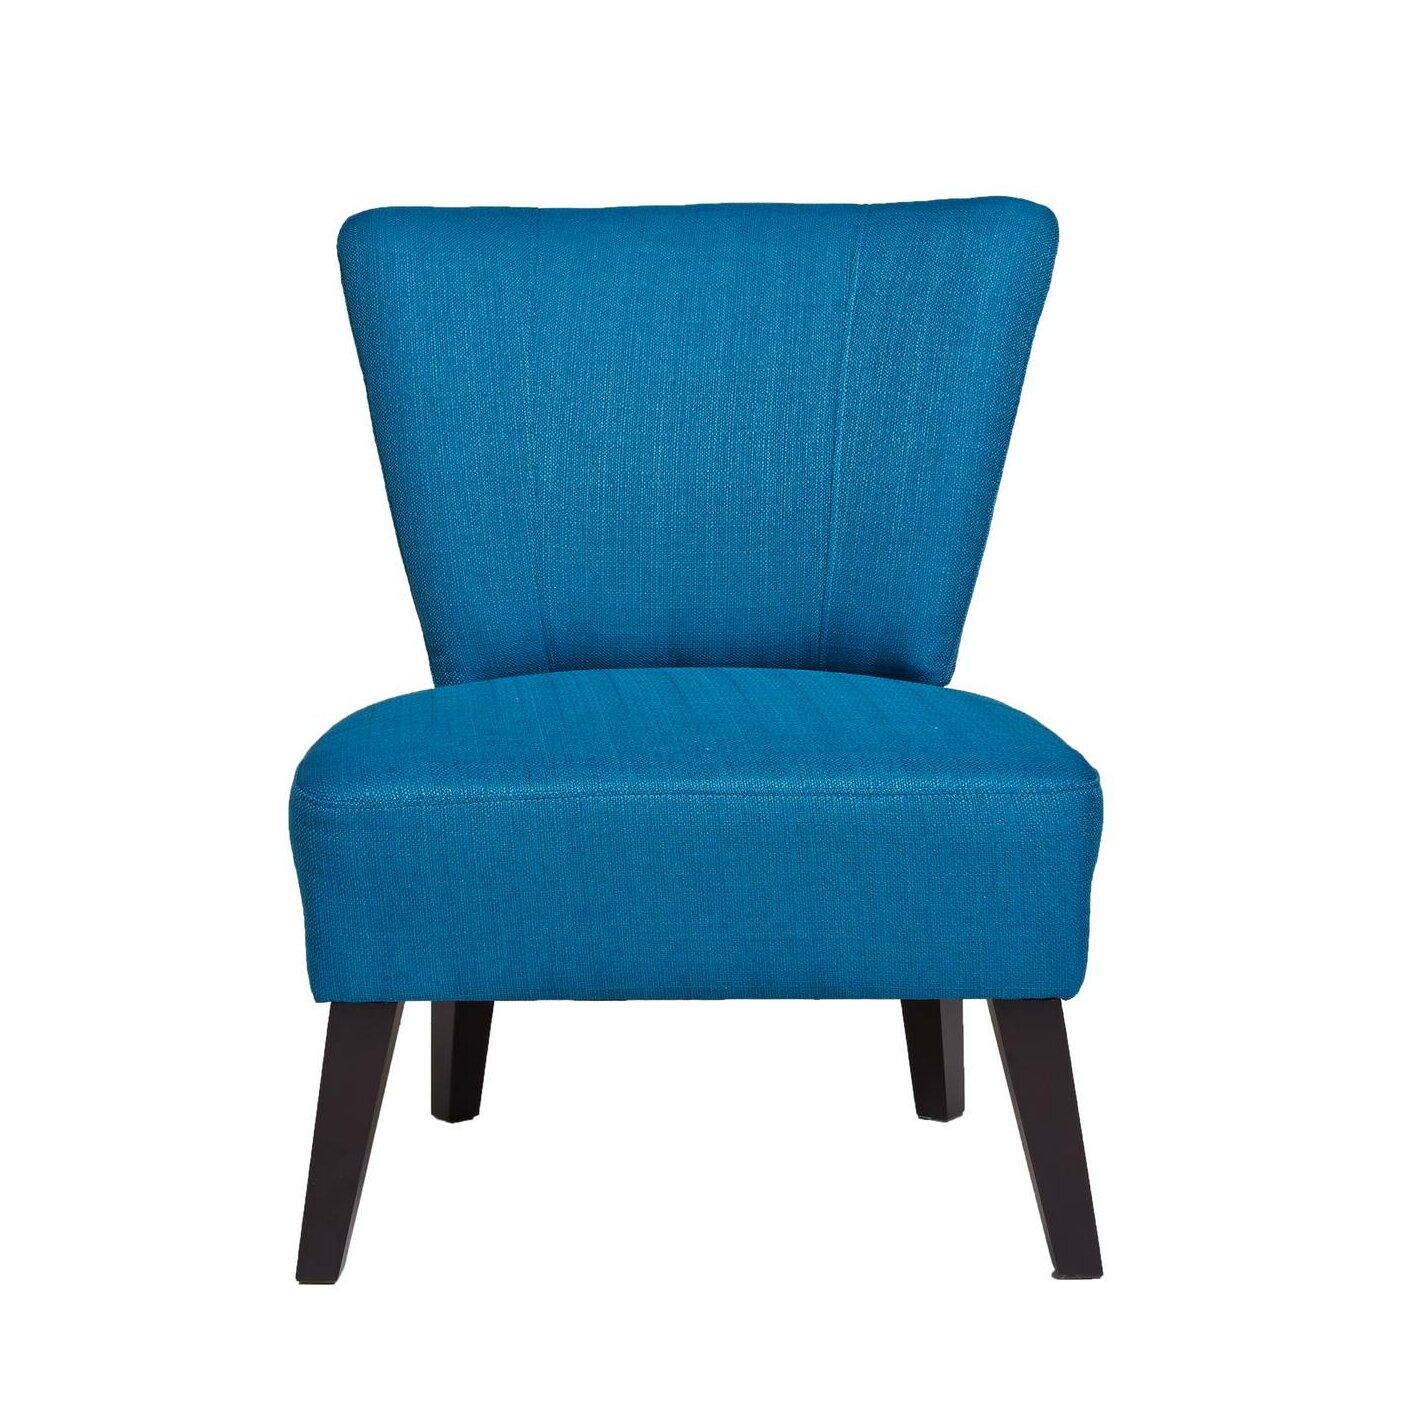 Kaleidoscopefurniture malaga slipper chair reviews wayfair - Furniture malaga ...